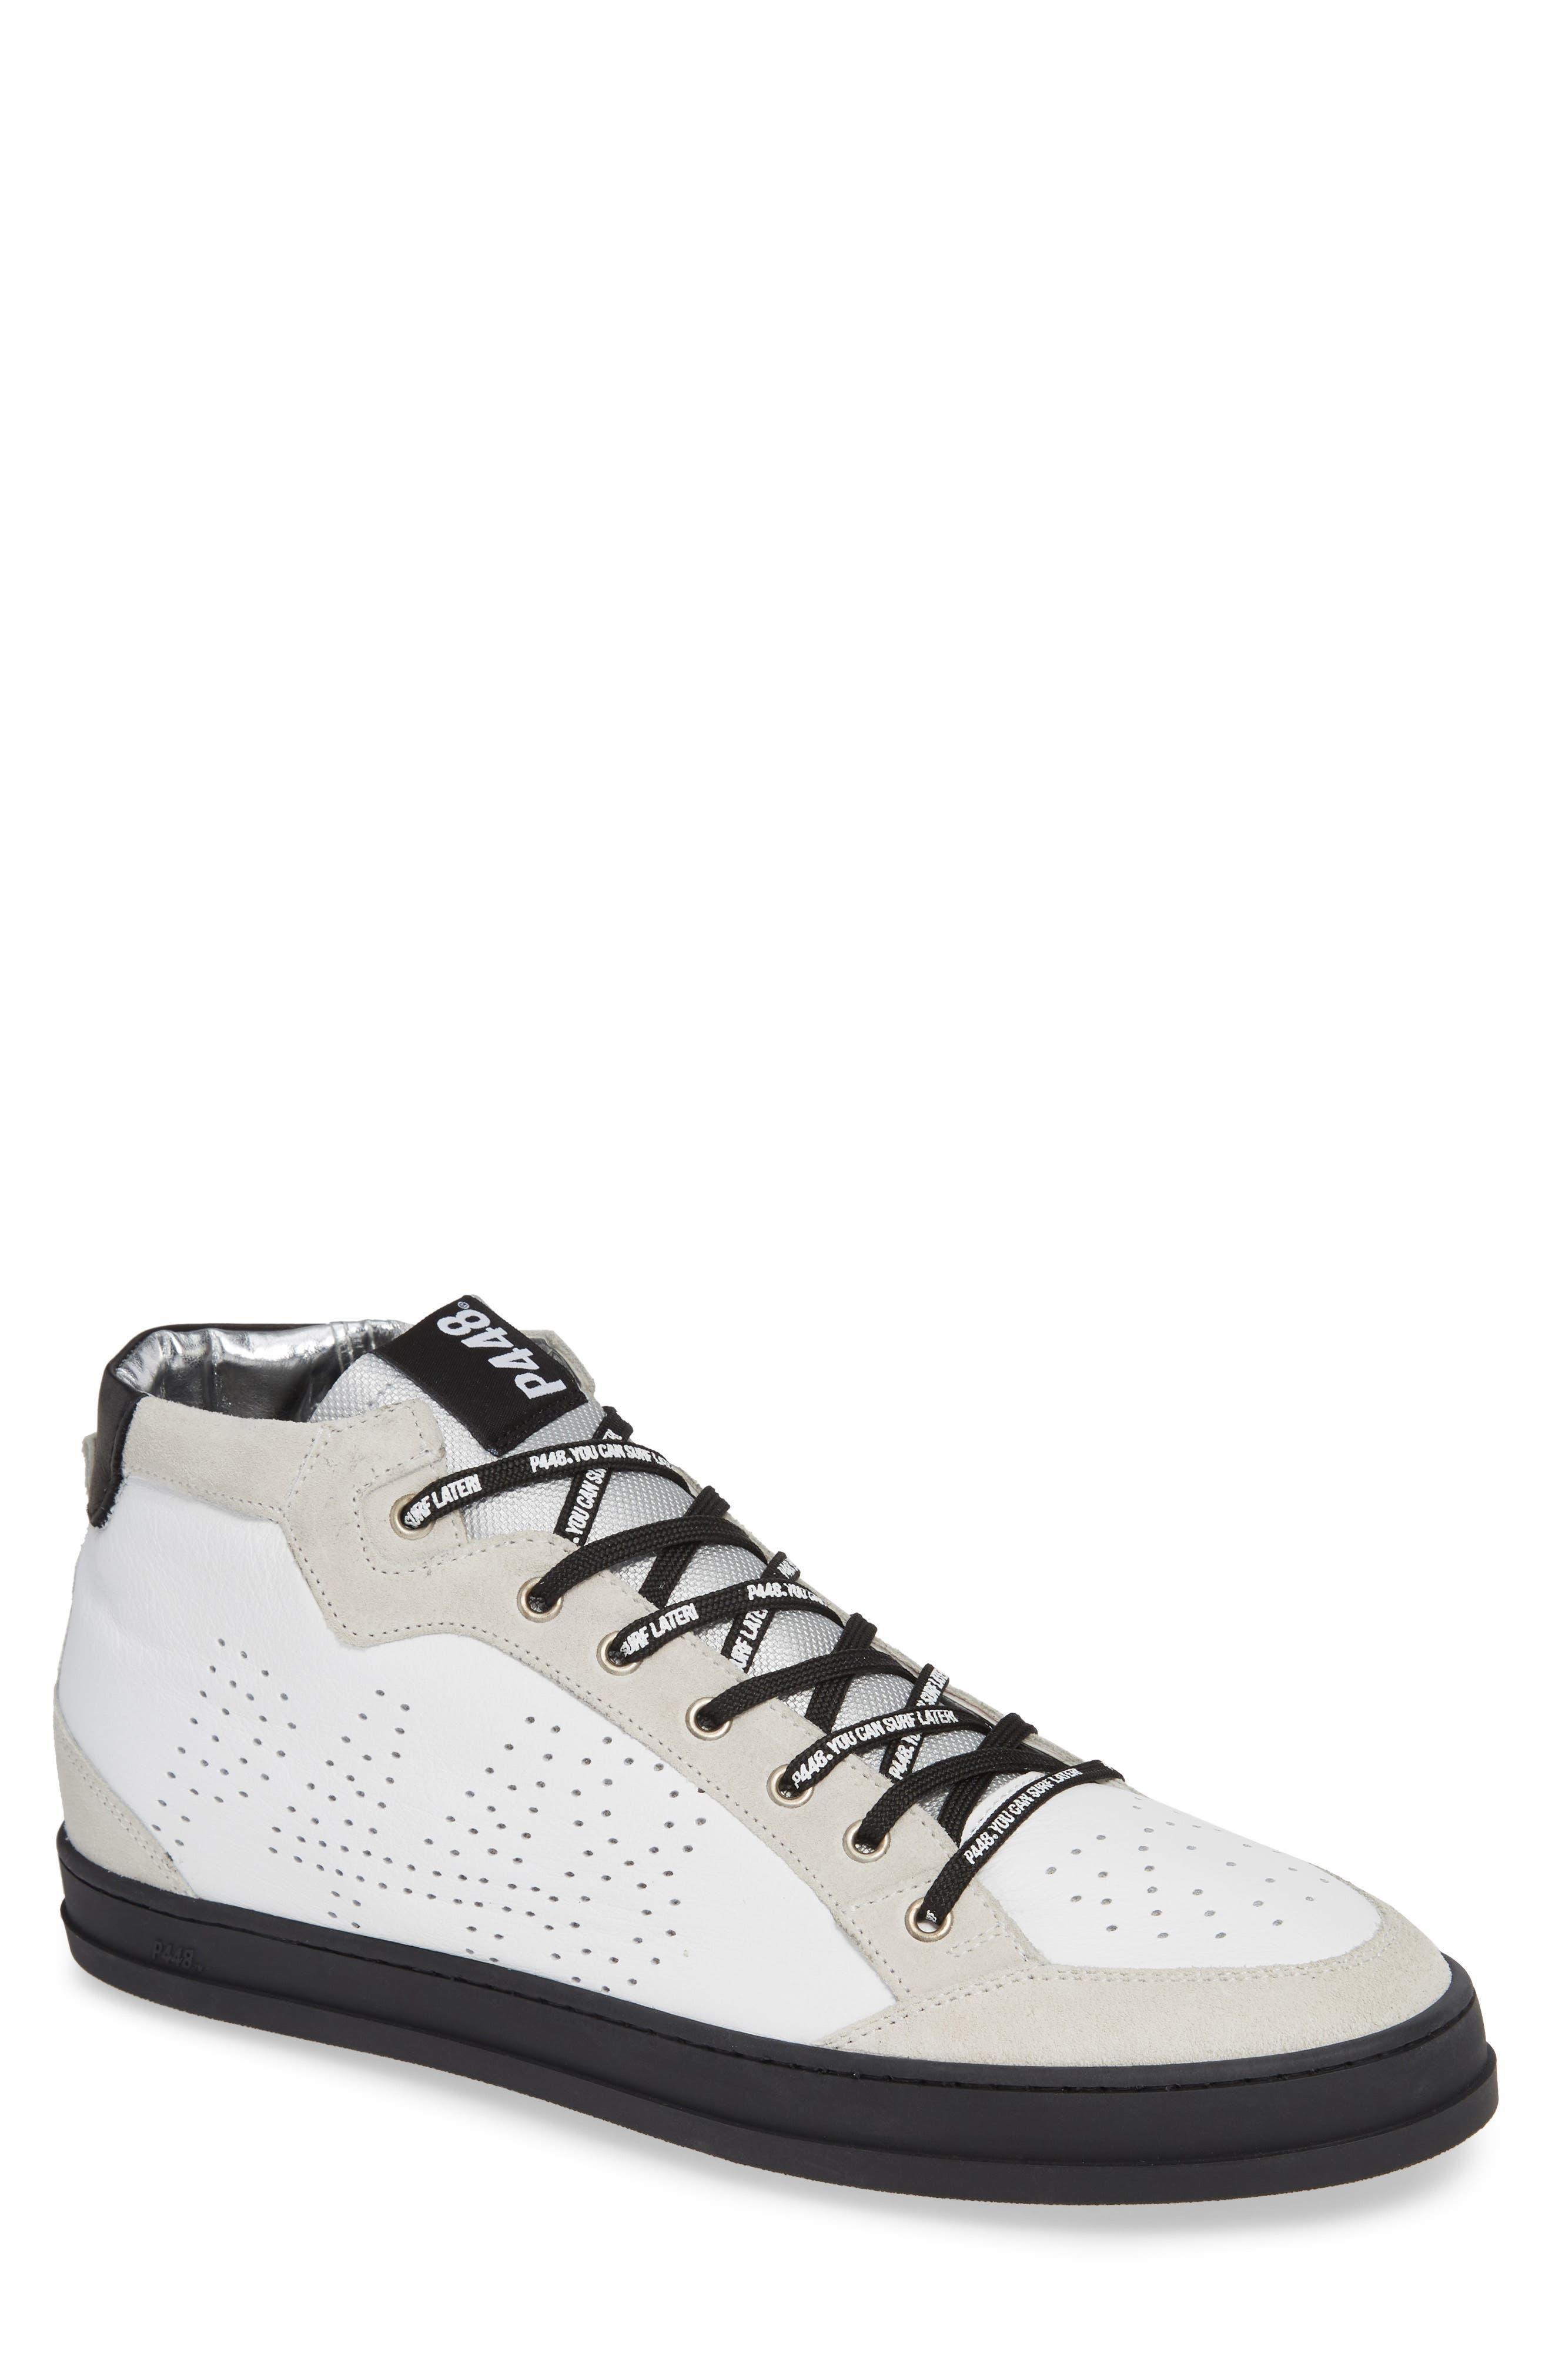 A8Love Mid Top Sneaker,                         Main,                         color, WHITE/ BLACK